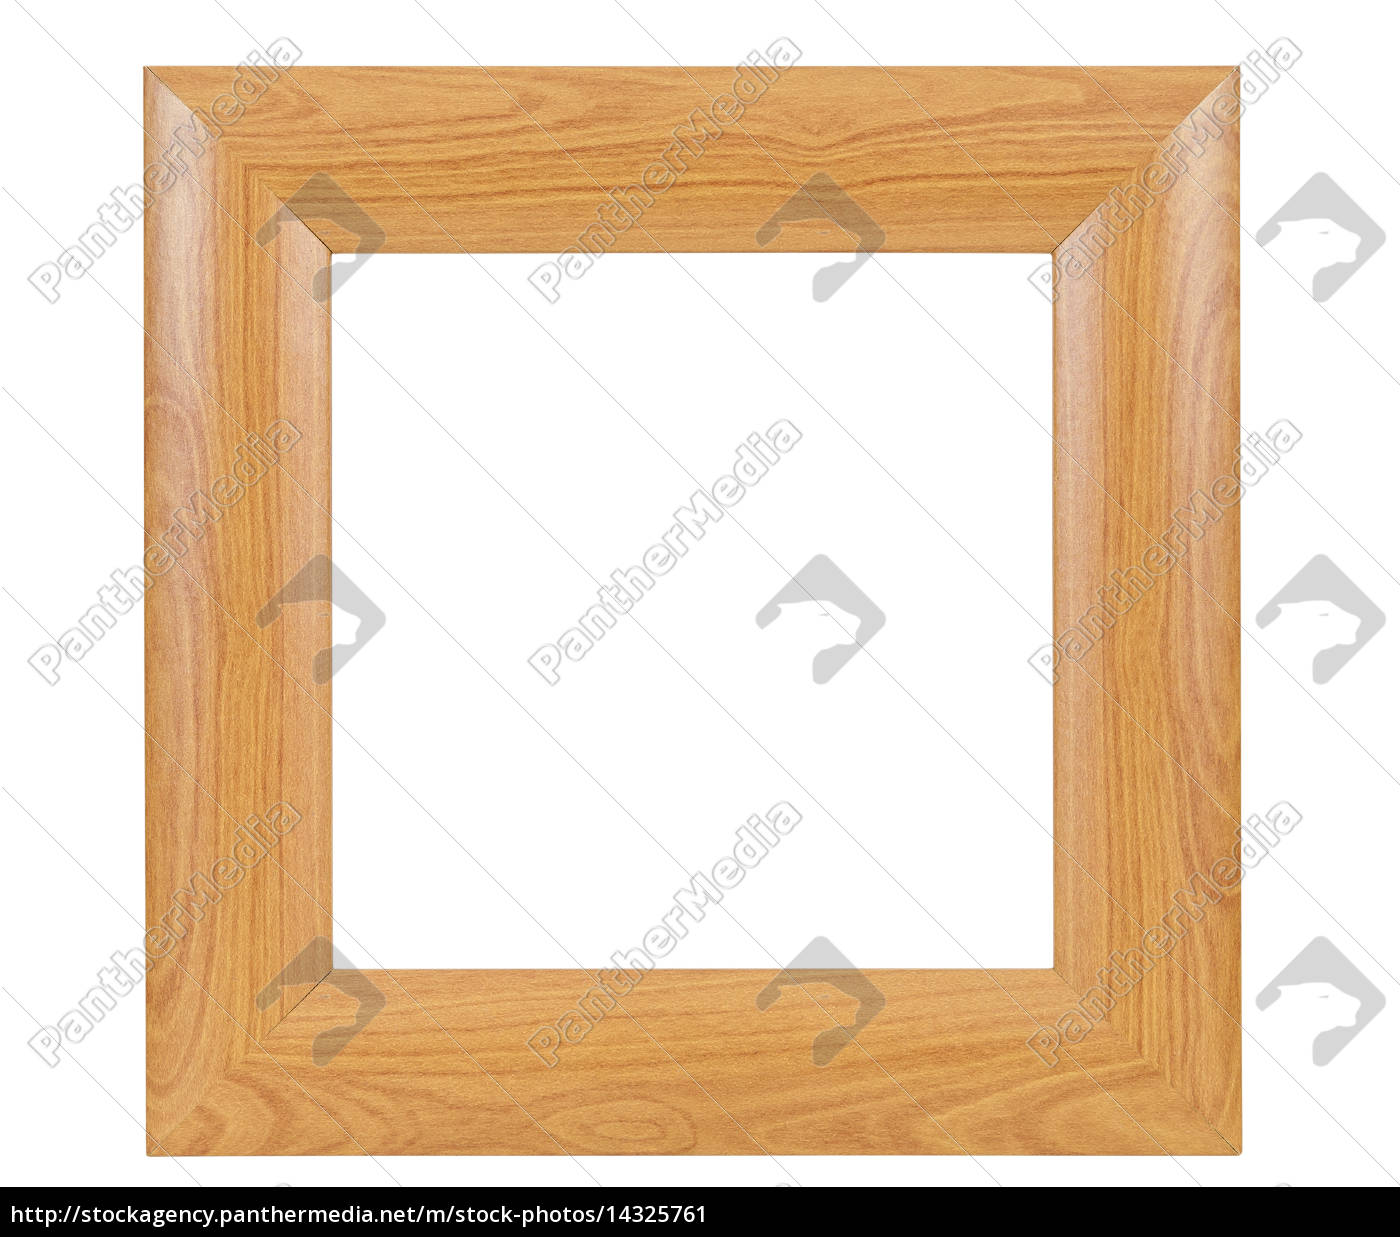 dunkle quadrat bilderrahmen aus holz - Lizenzfreies Bild - #14325761 ...